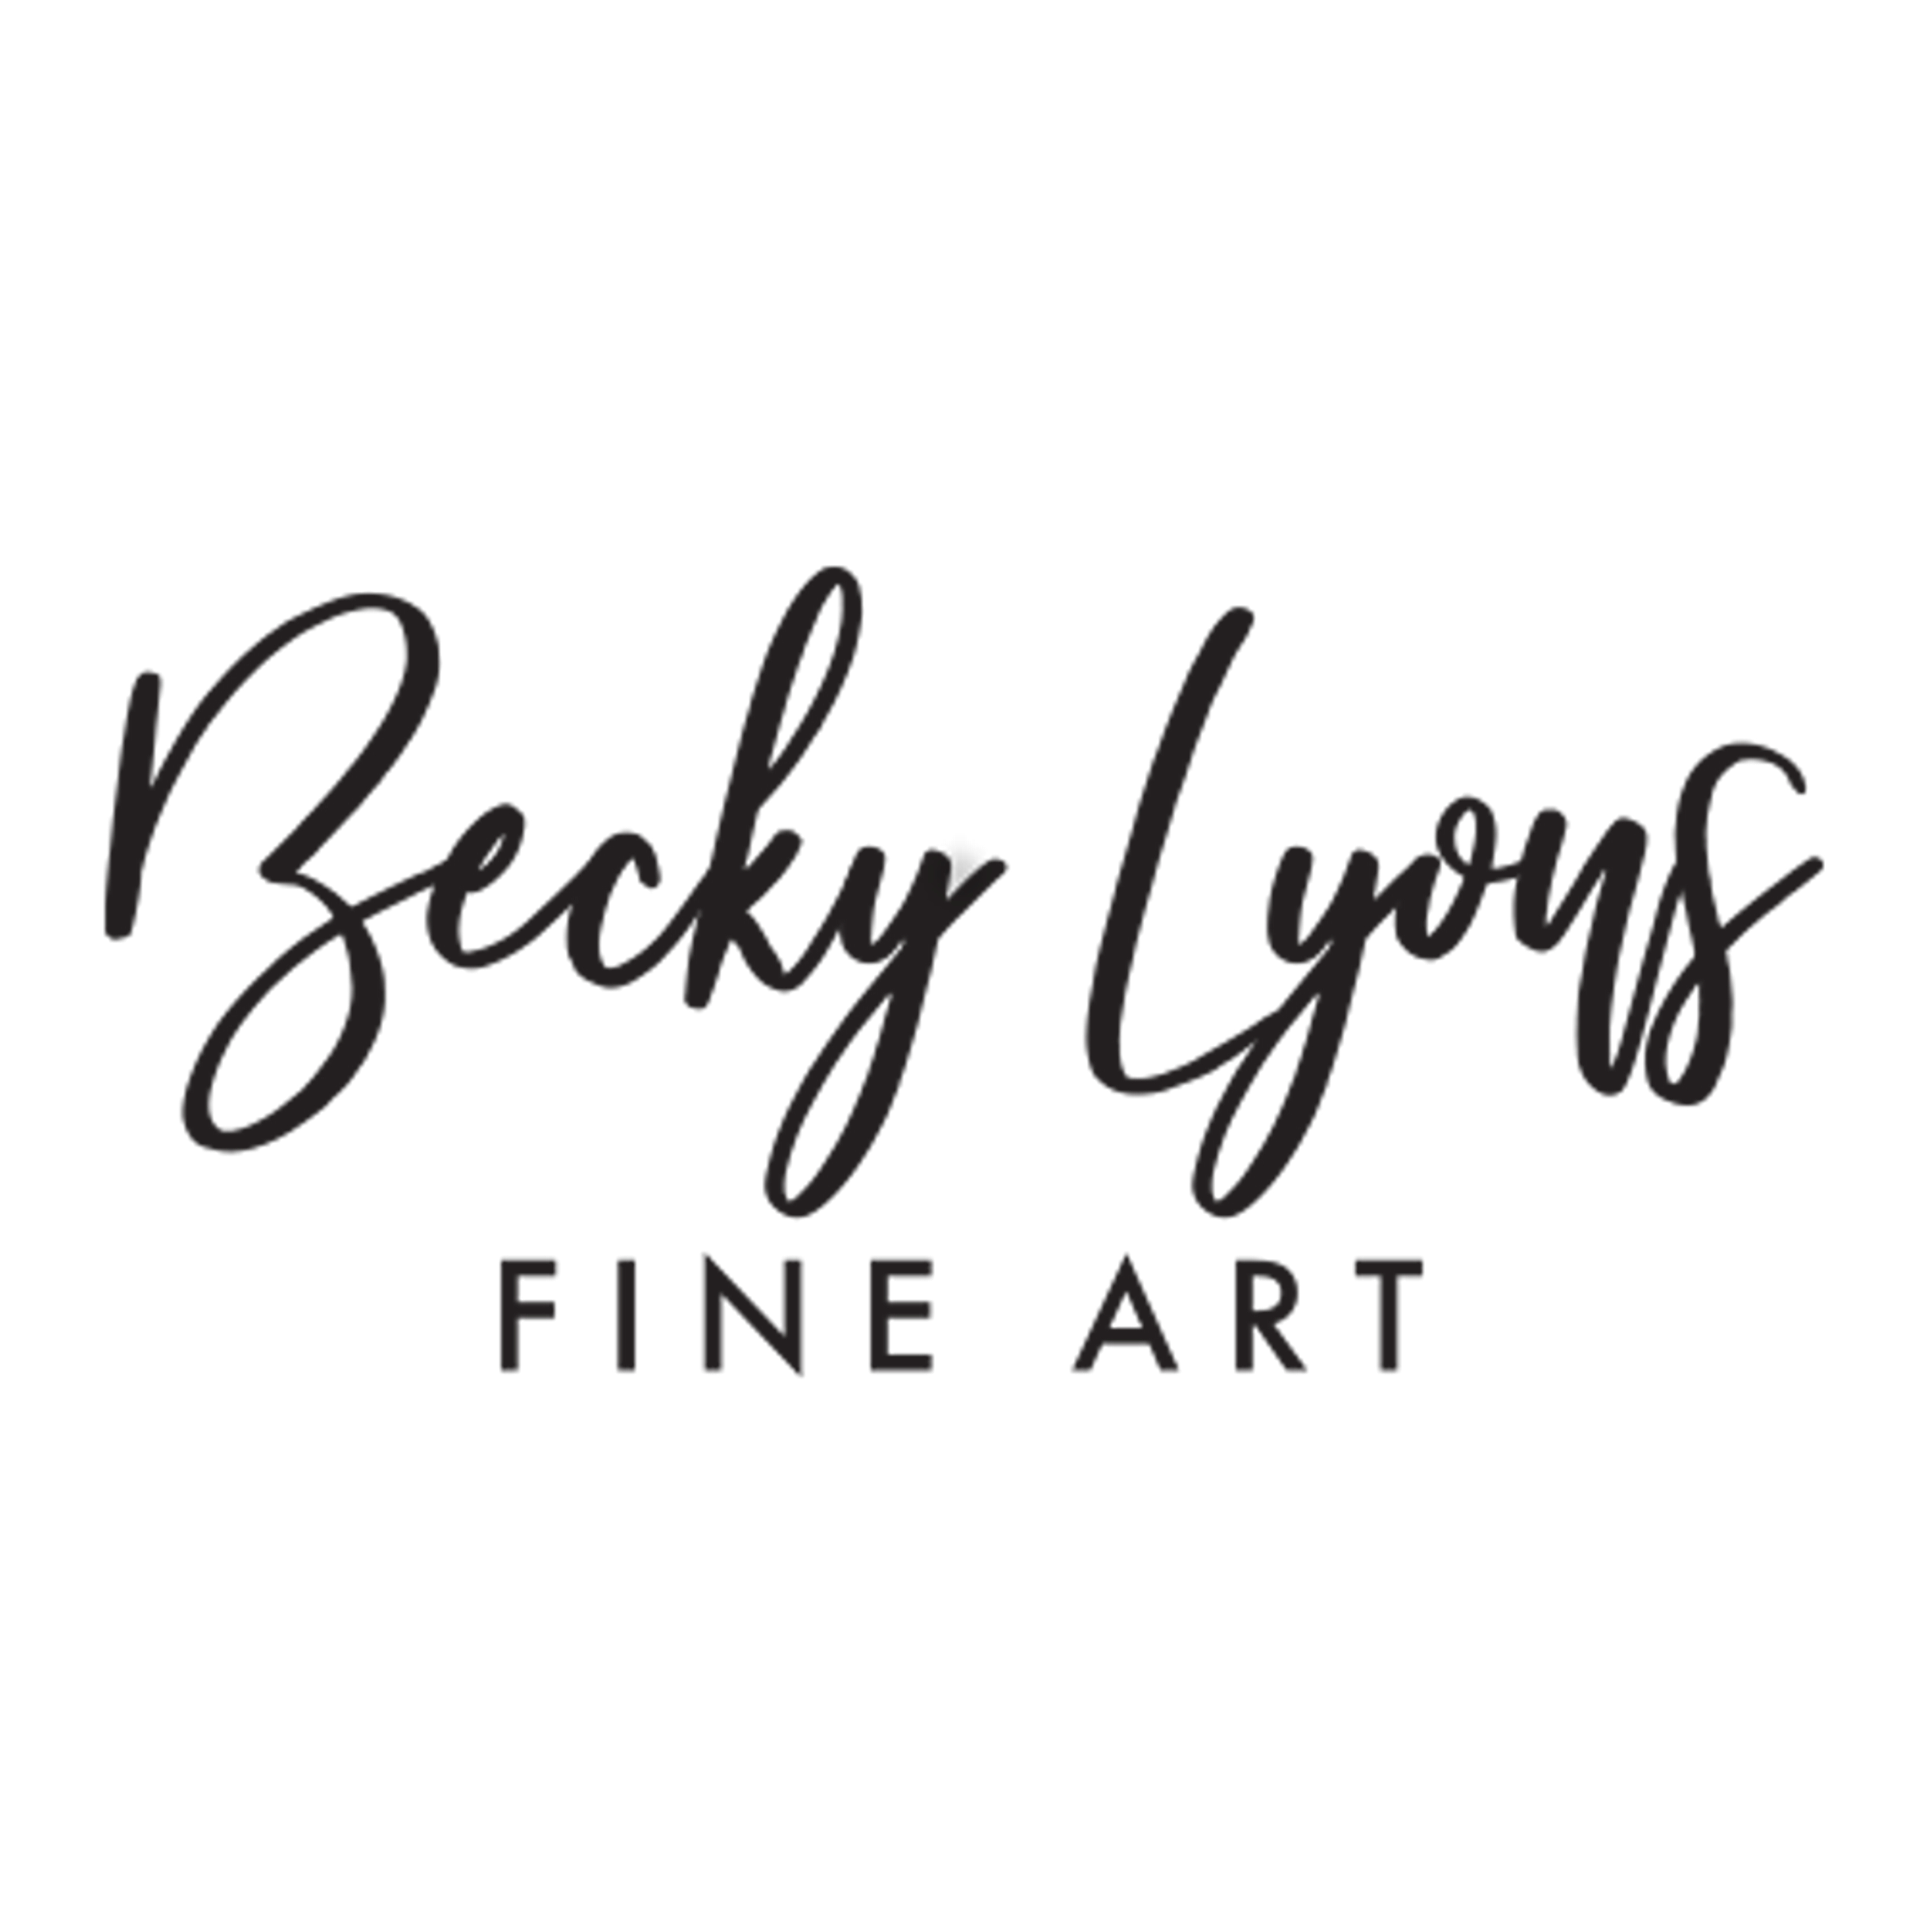 Becky Lyons Fine Art